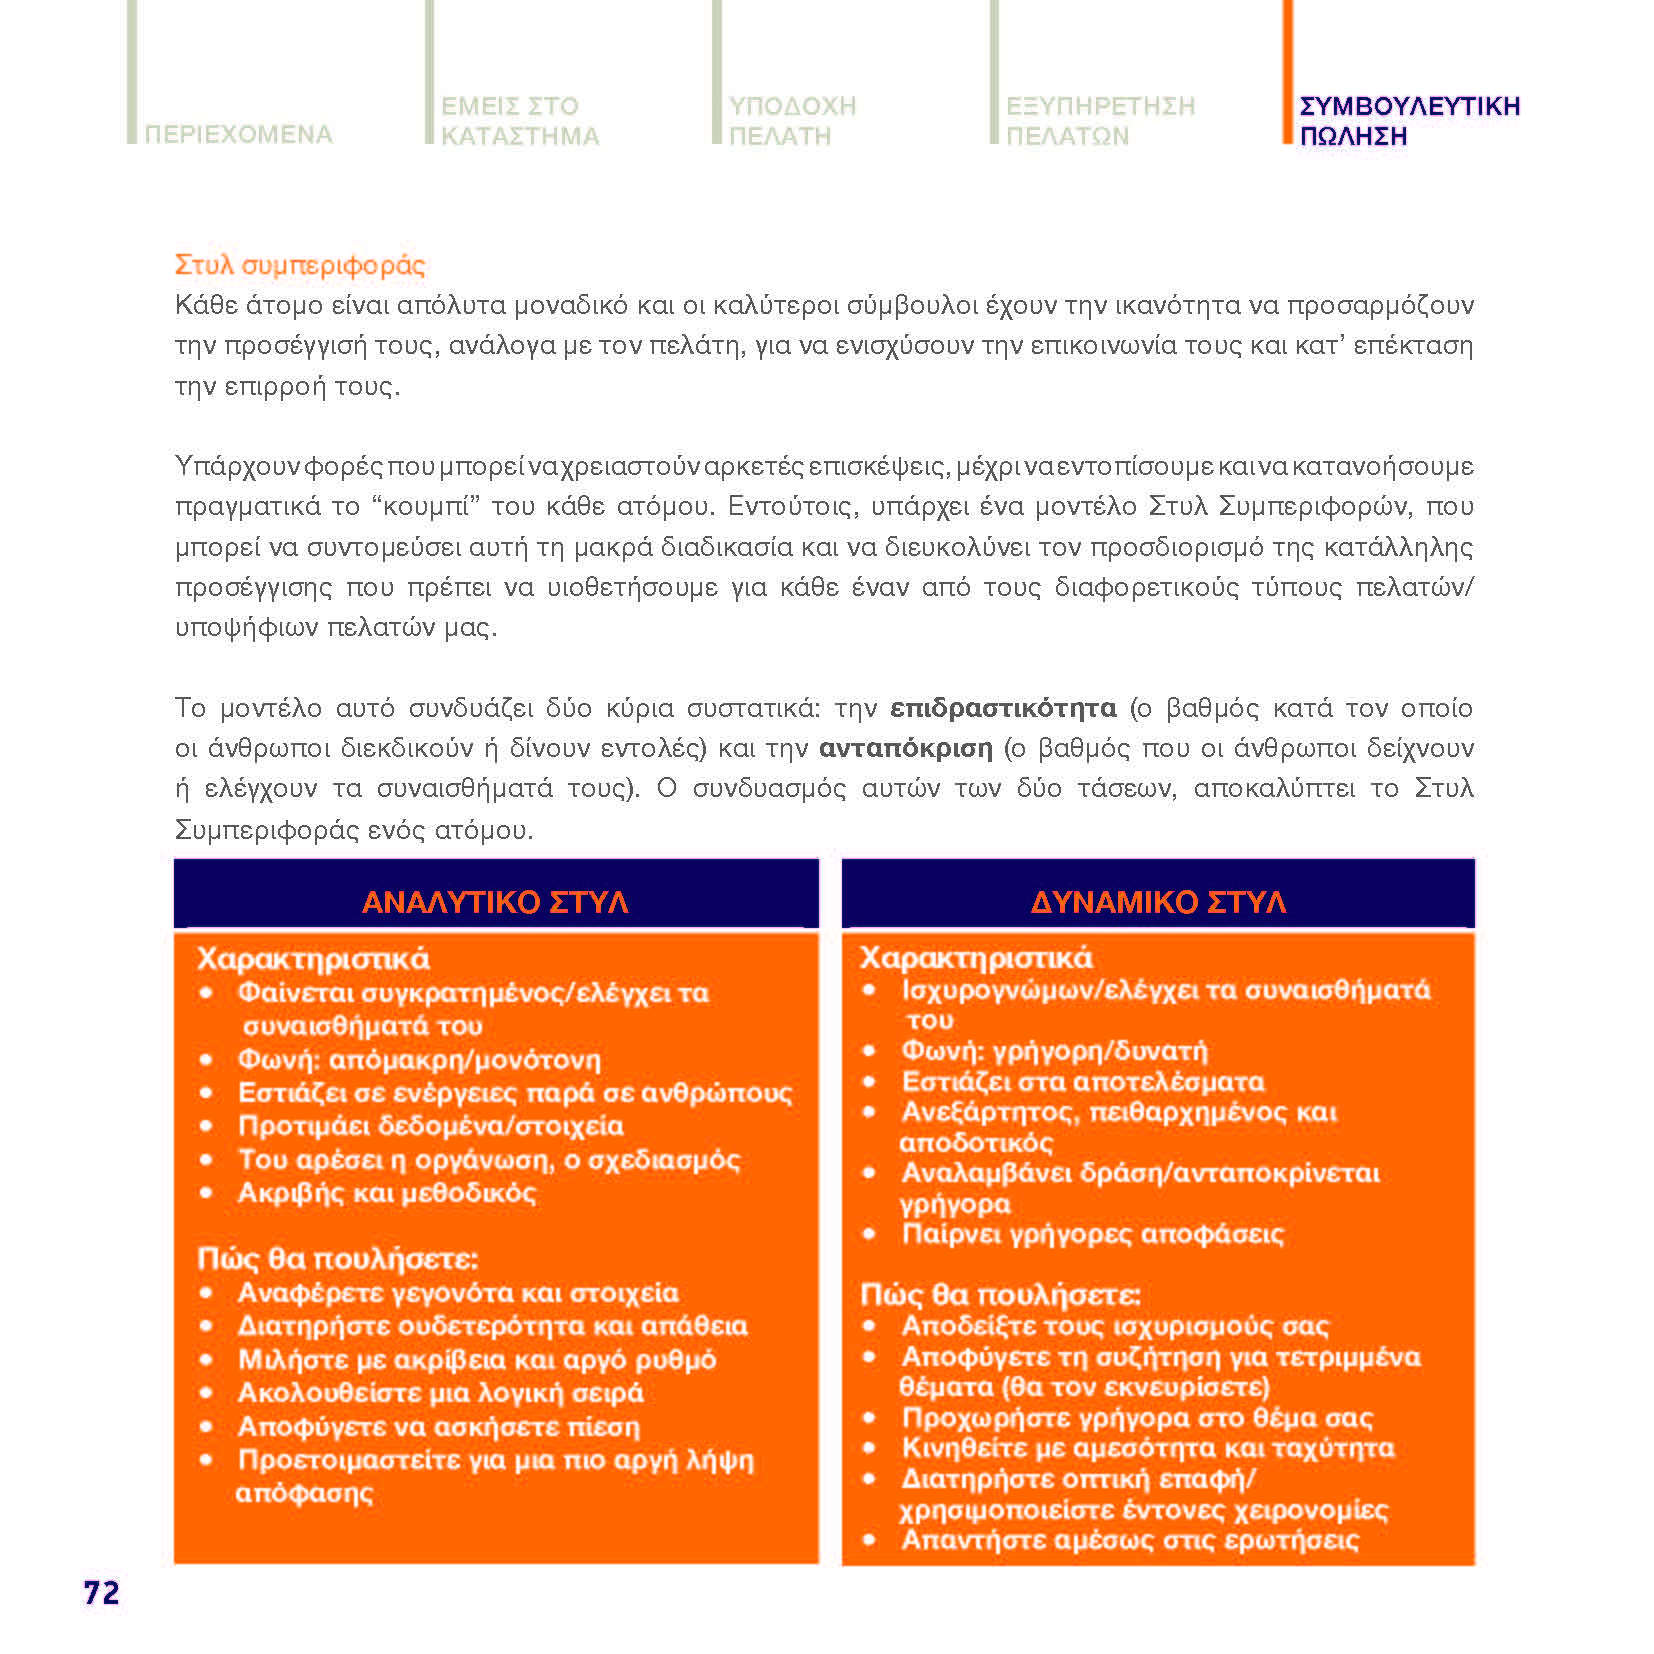 https://www.jib.gr/wp-content/uploads/2020/09/OPTIMA-BANK-BOOKLET-WEB_Page_072.jpg